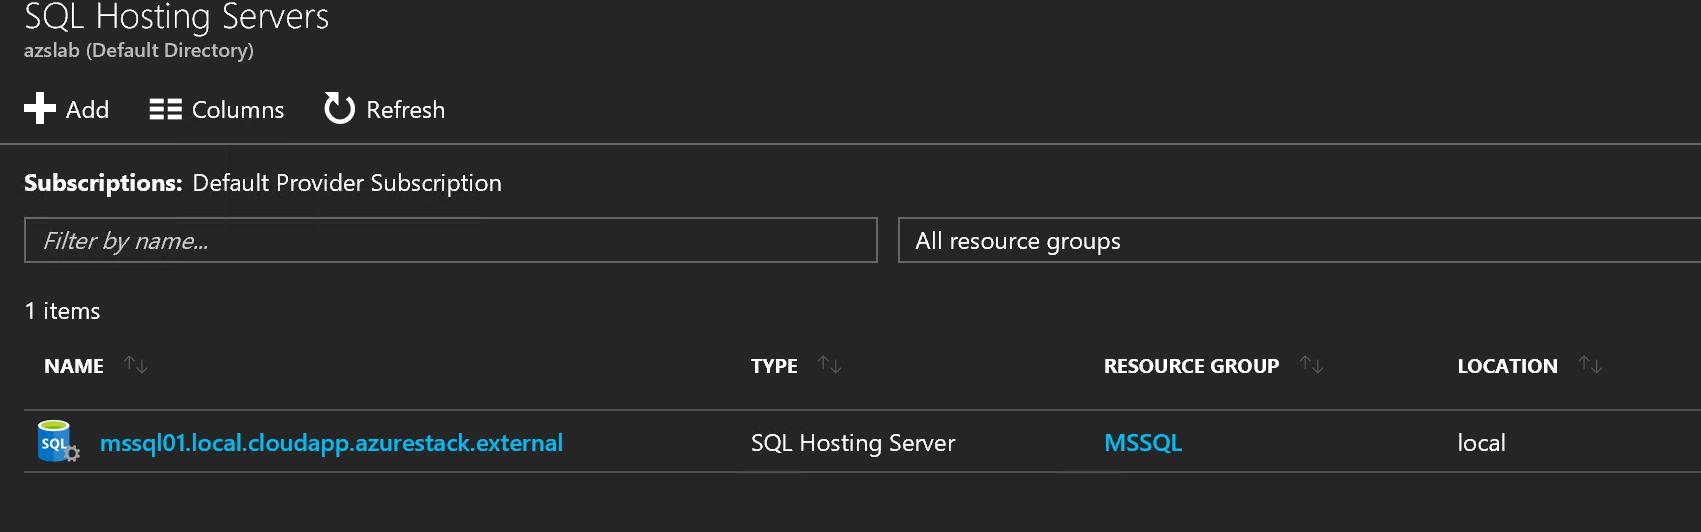 Added hosting server